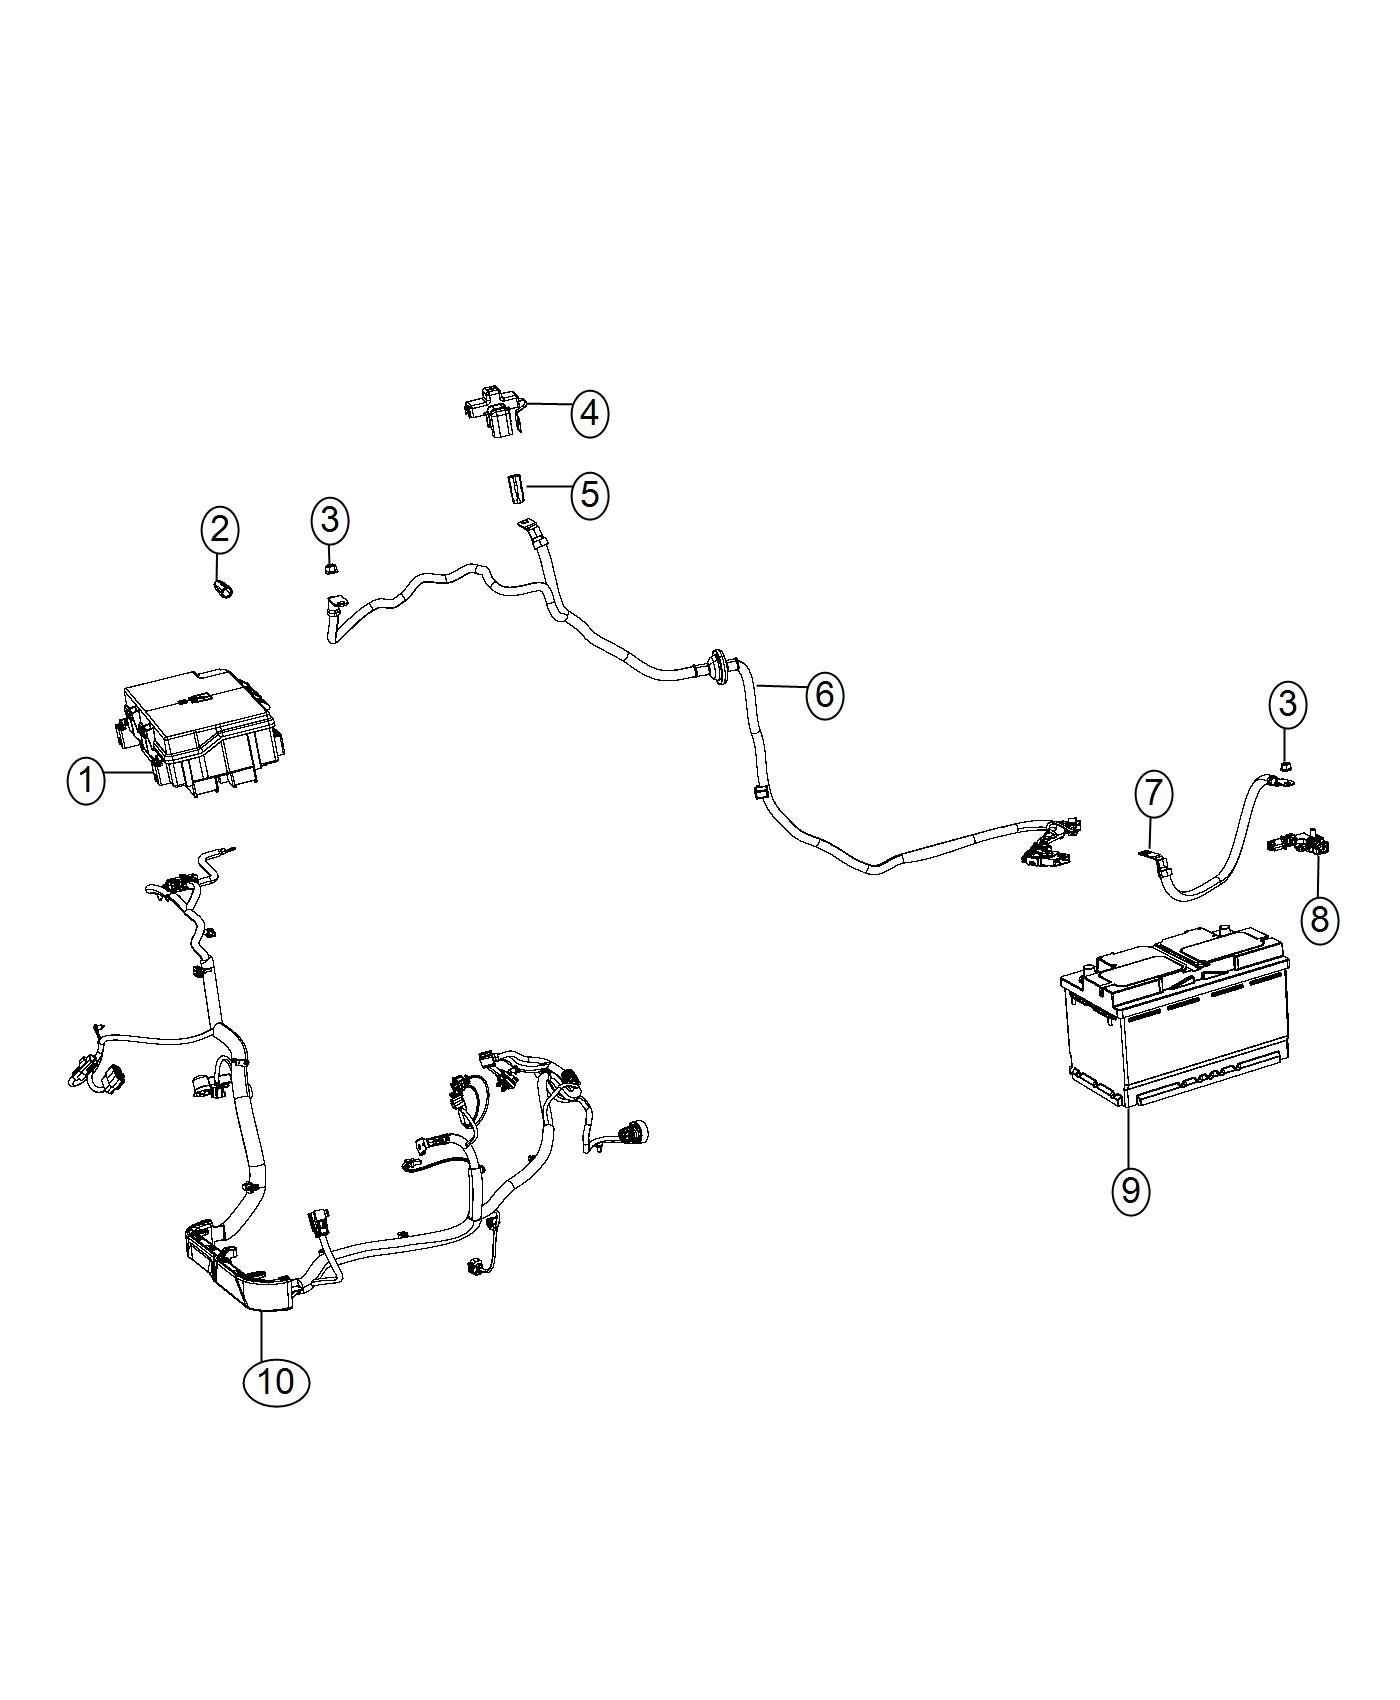 Jeep Grand Cherokee Sensor Battery Negative Cable